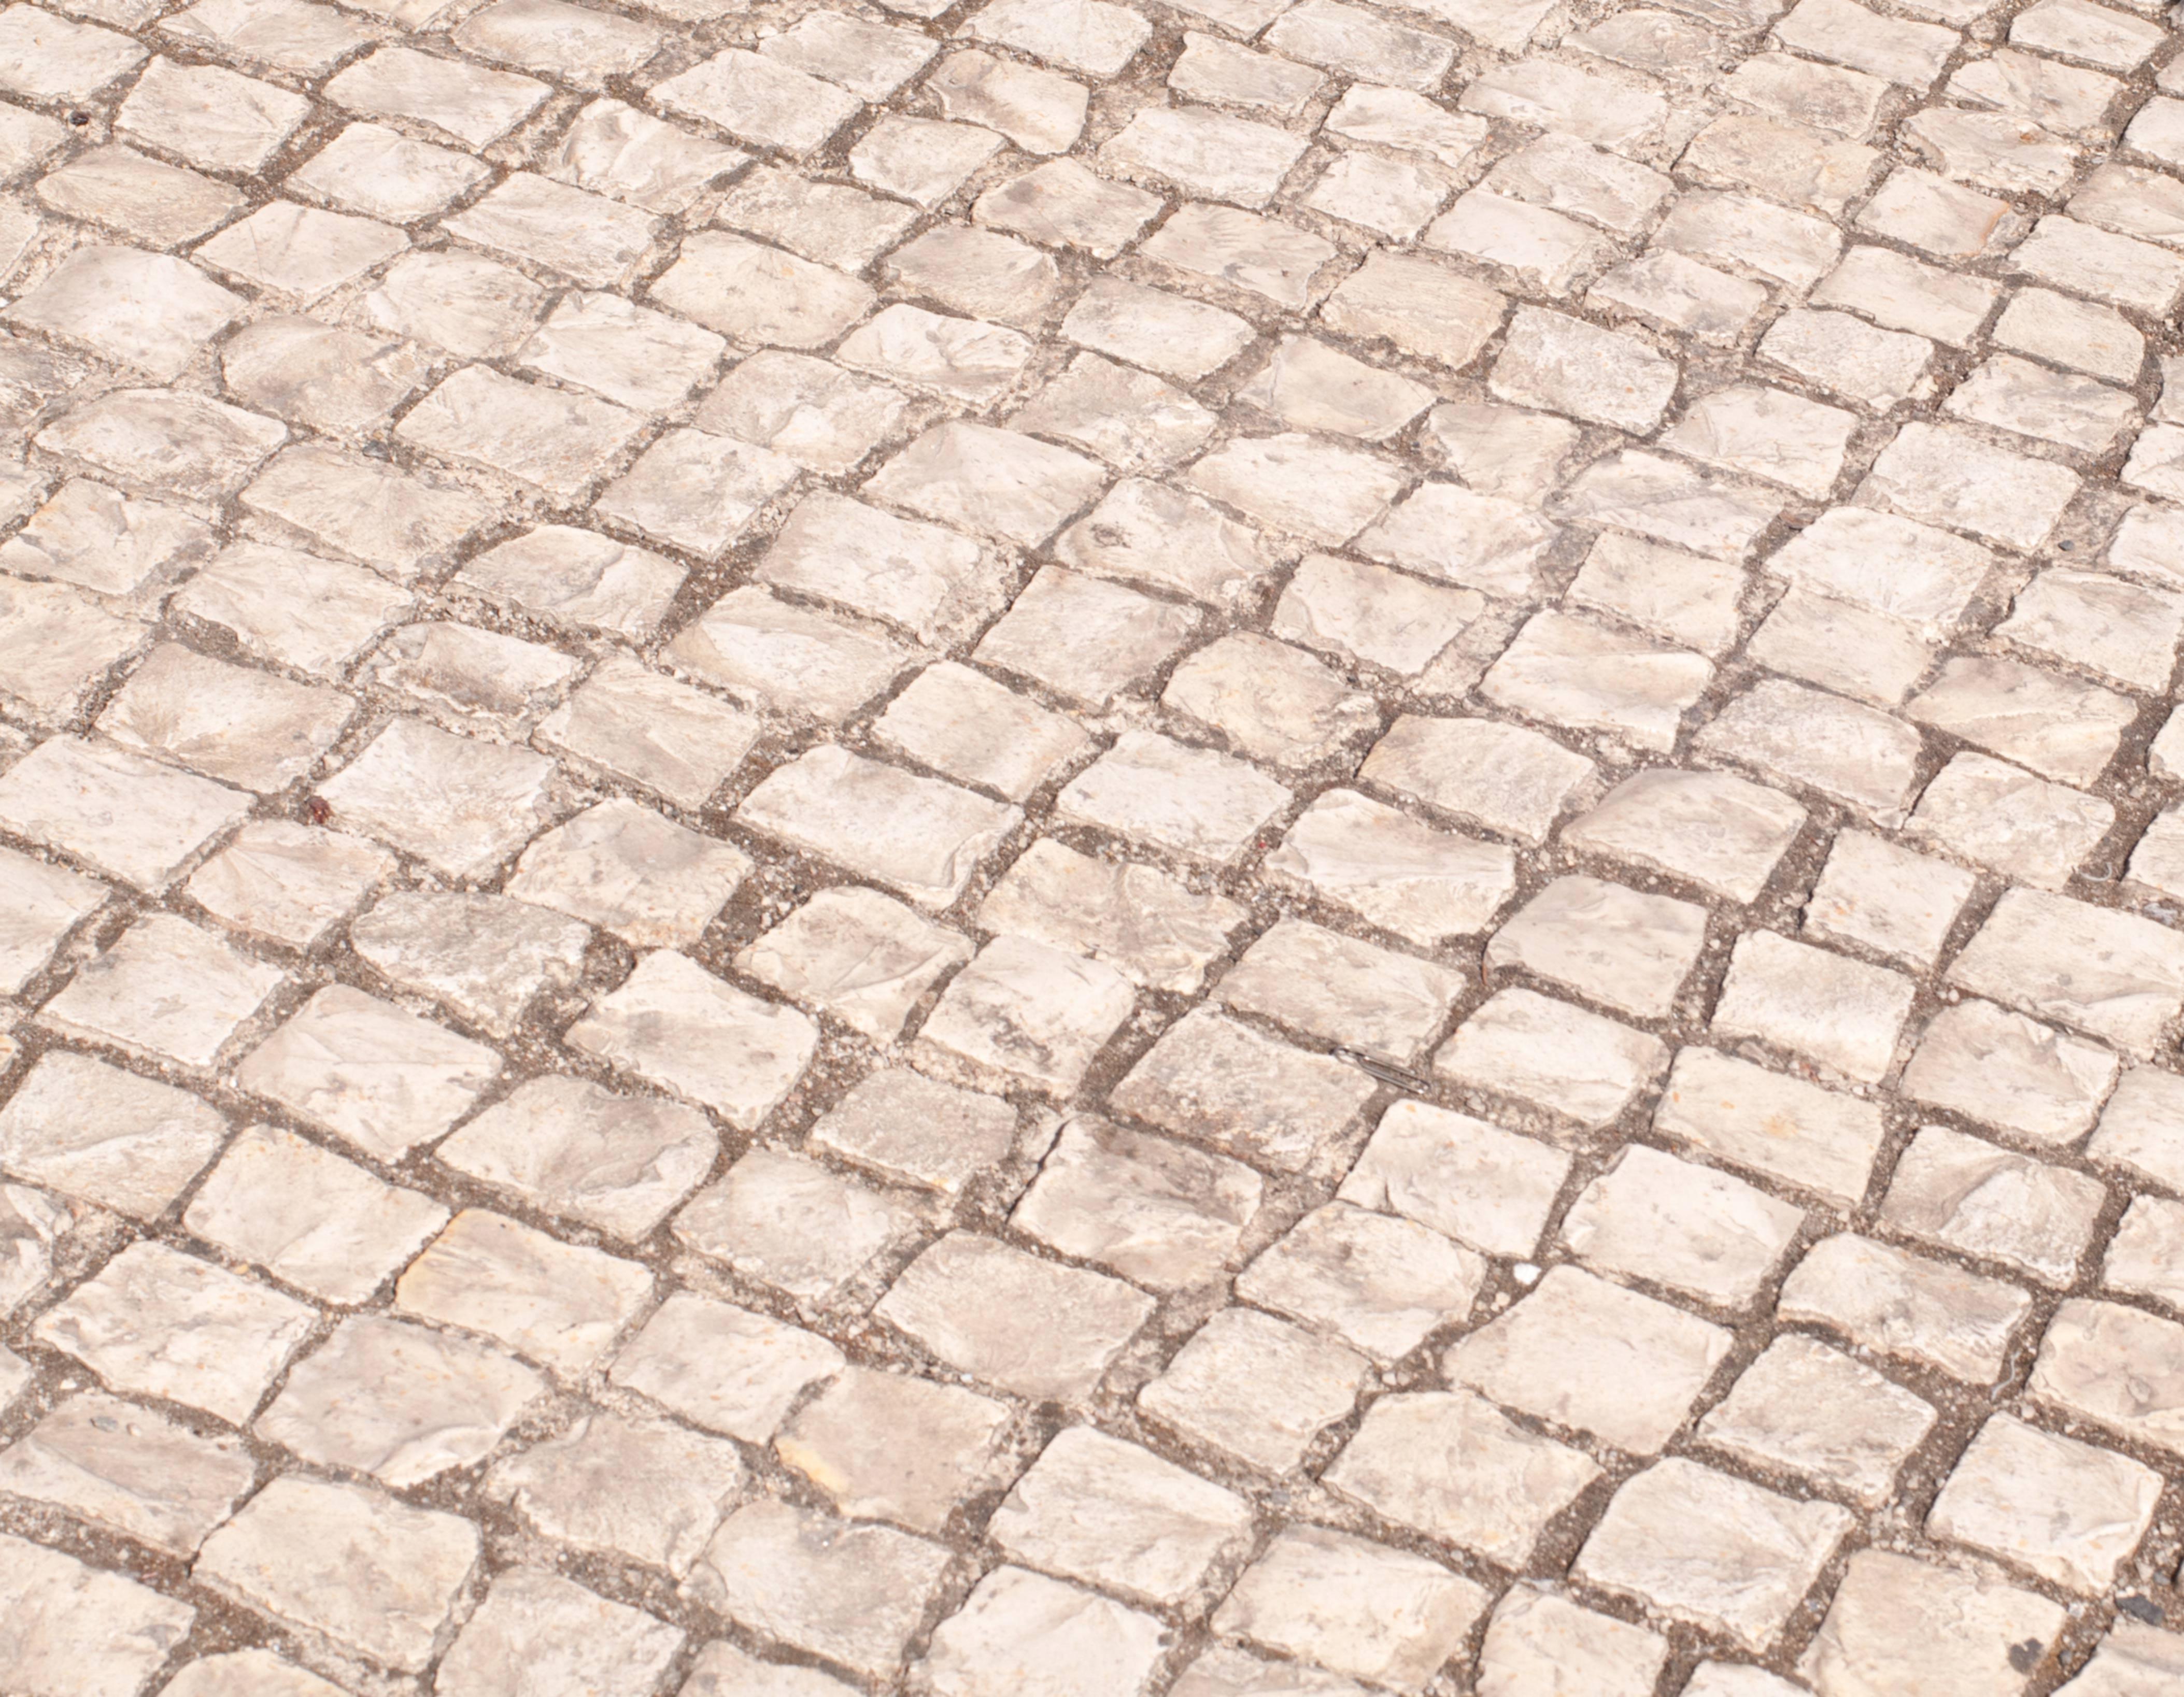 Square street stones background